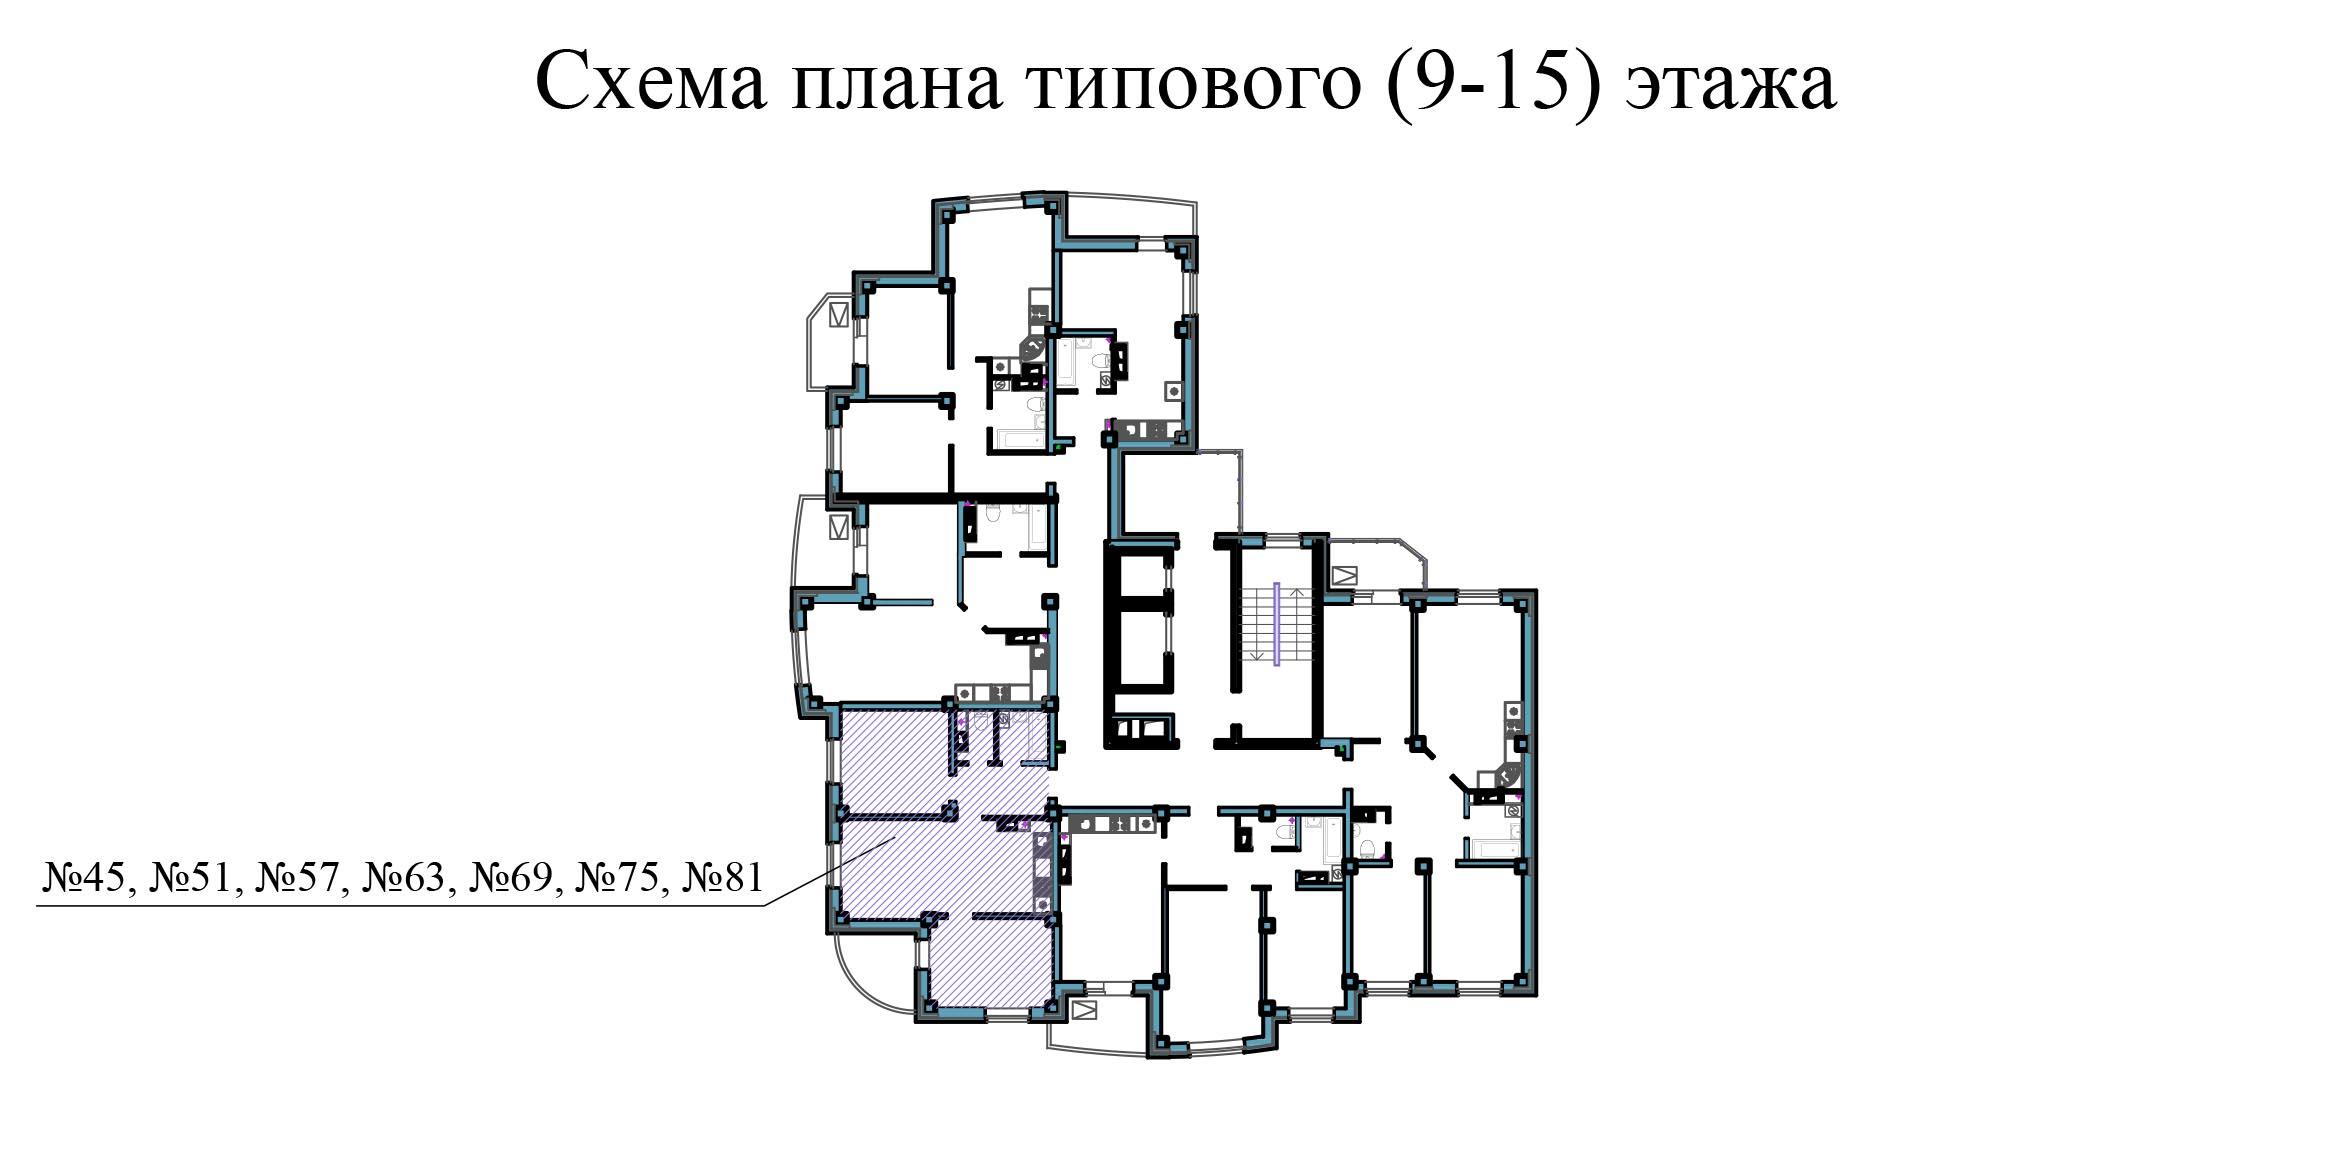 Двухкомнатная квартира - ул.Балтийская, д. 1а, кв. 45, 51, 57, 63, 69, 75, 81